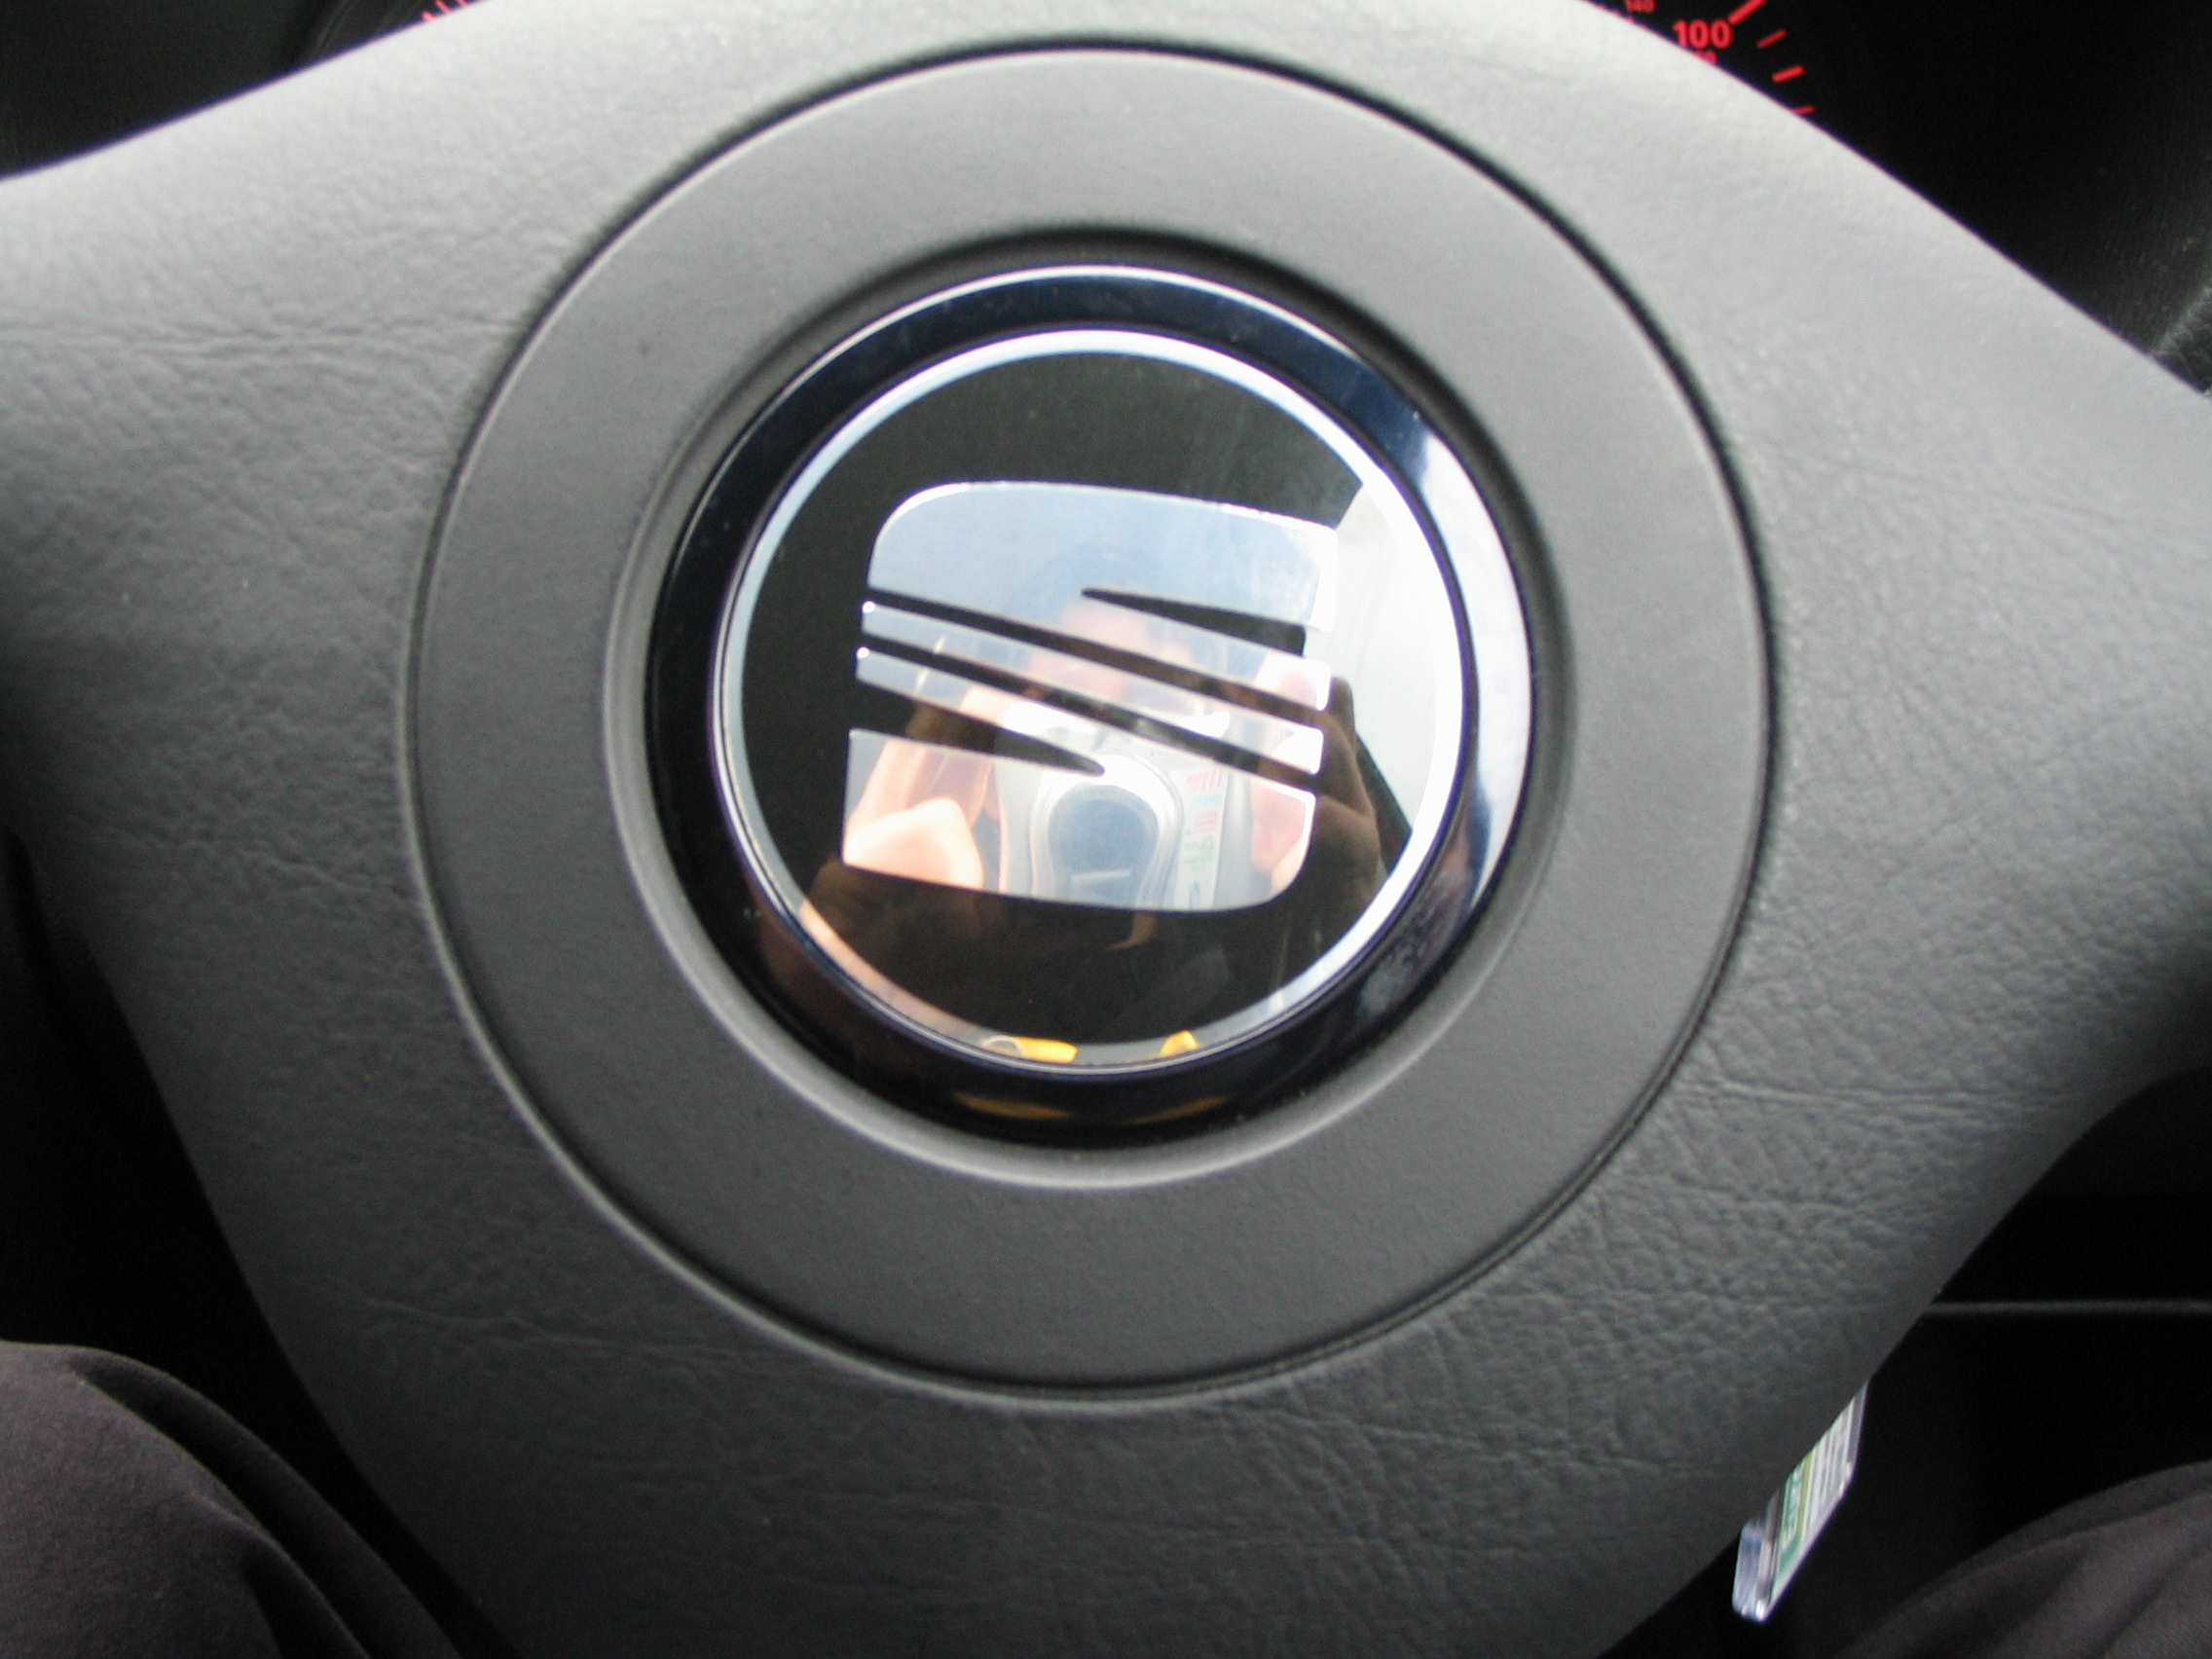 SEAT logo on steering wheel